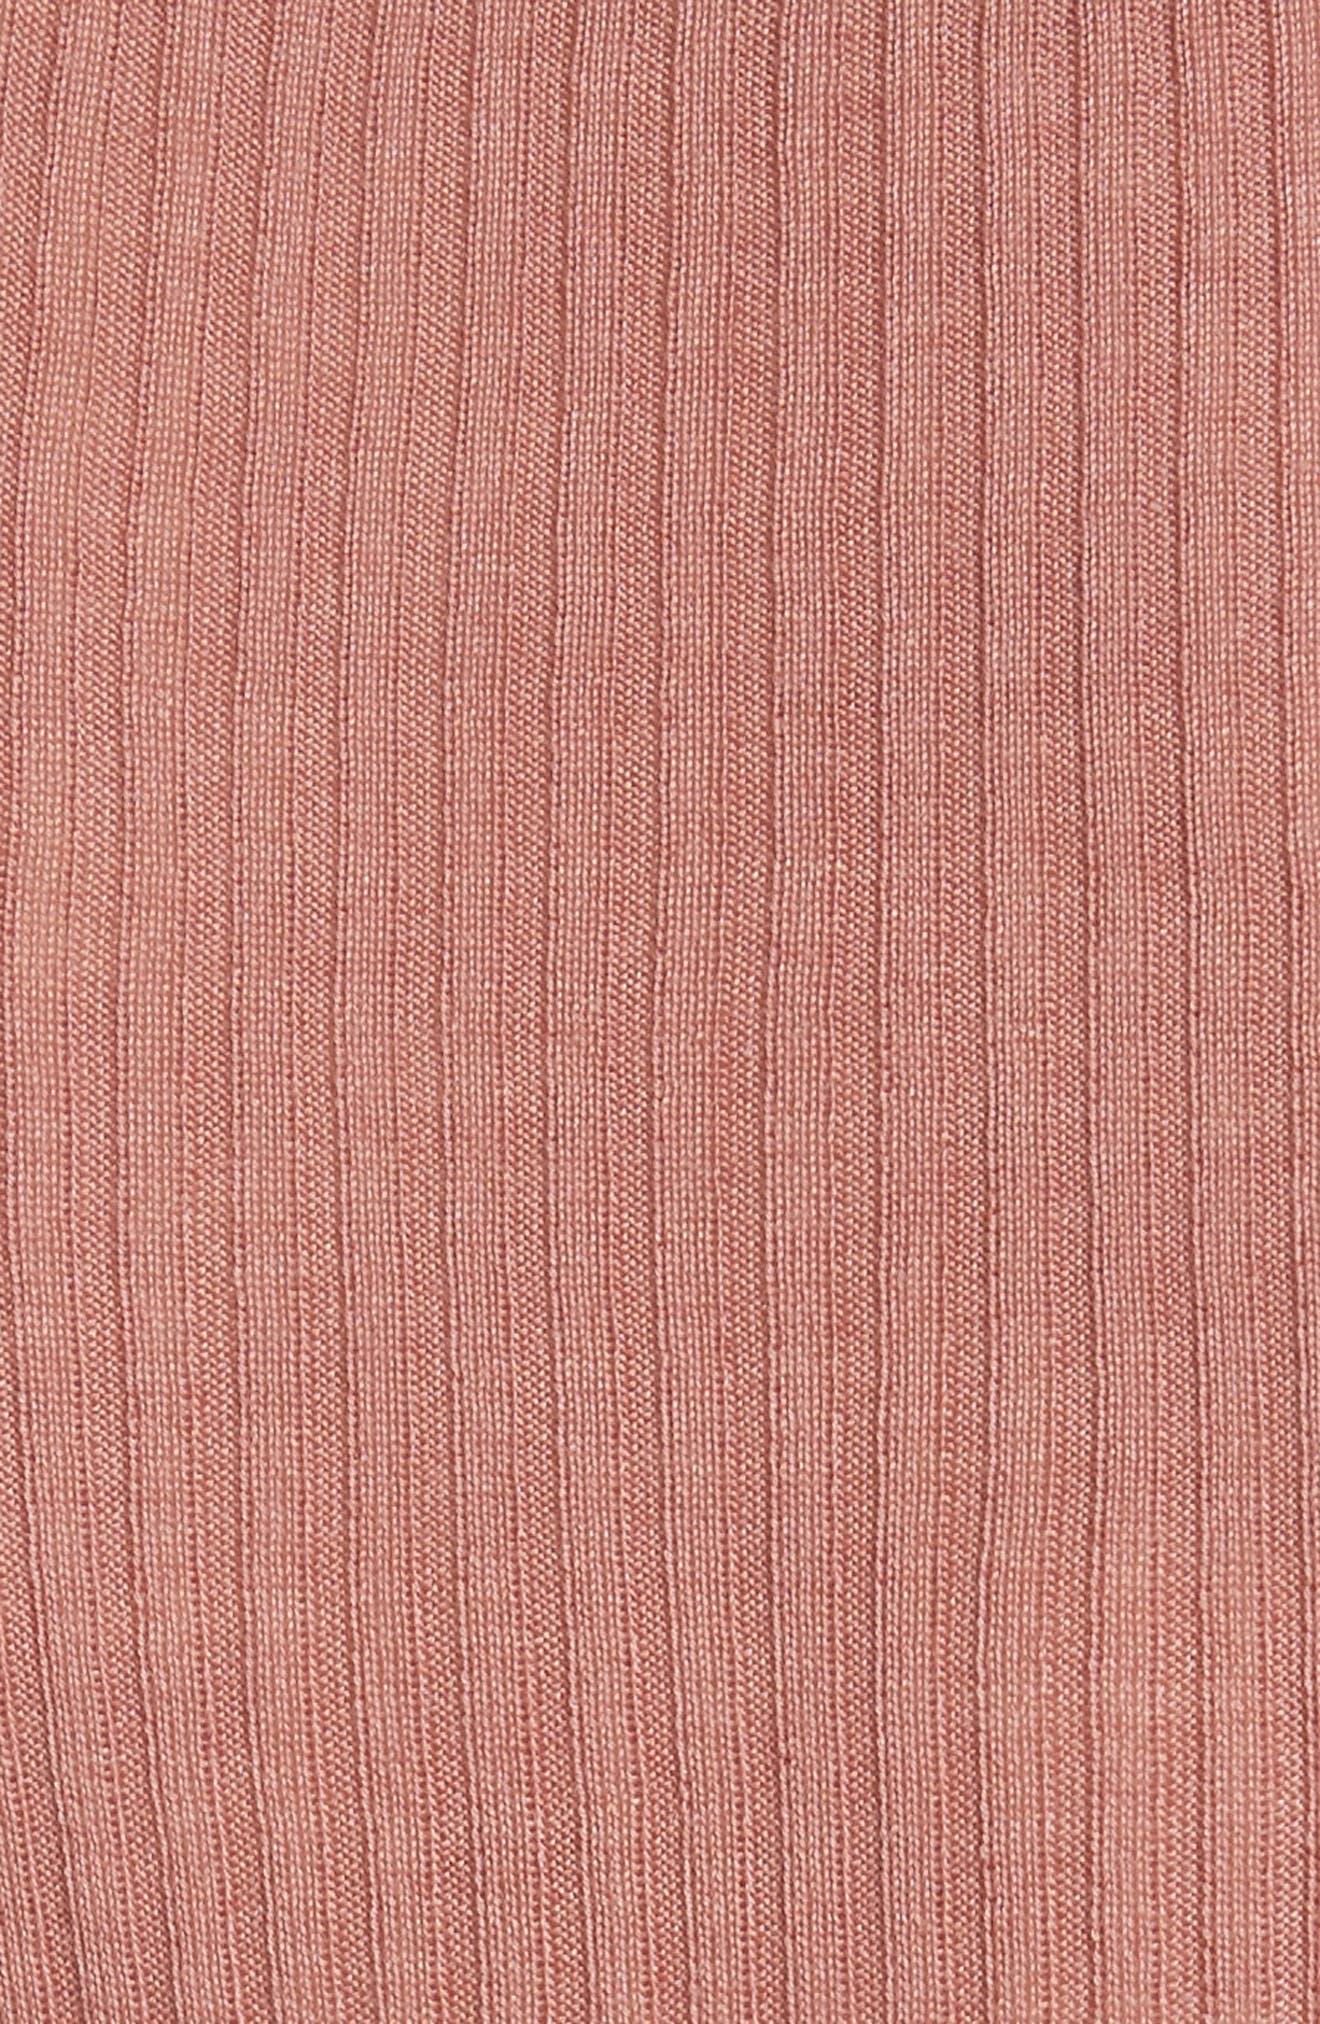 Wash N Go Rib Knit Tee,                             Alternate thumbnail 5, color,                             Guava